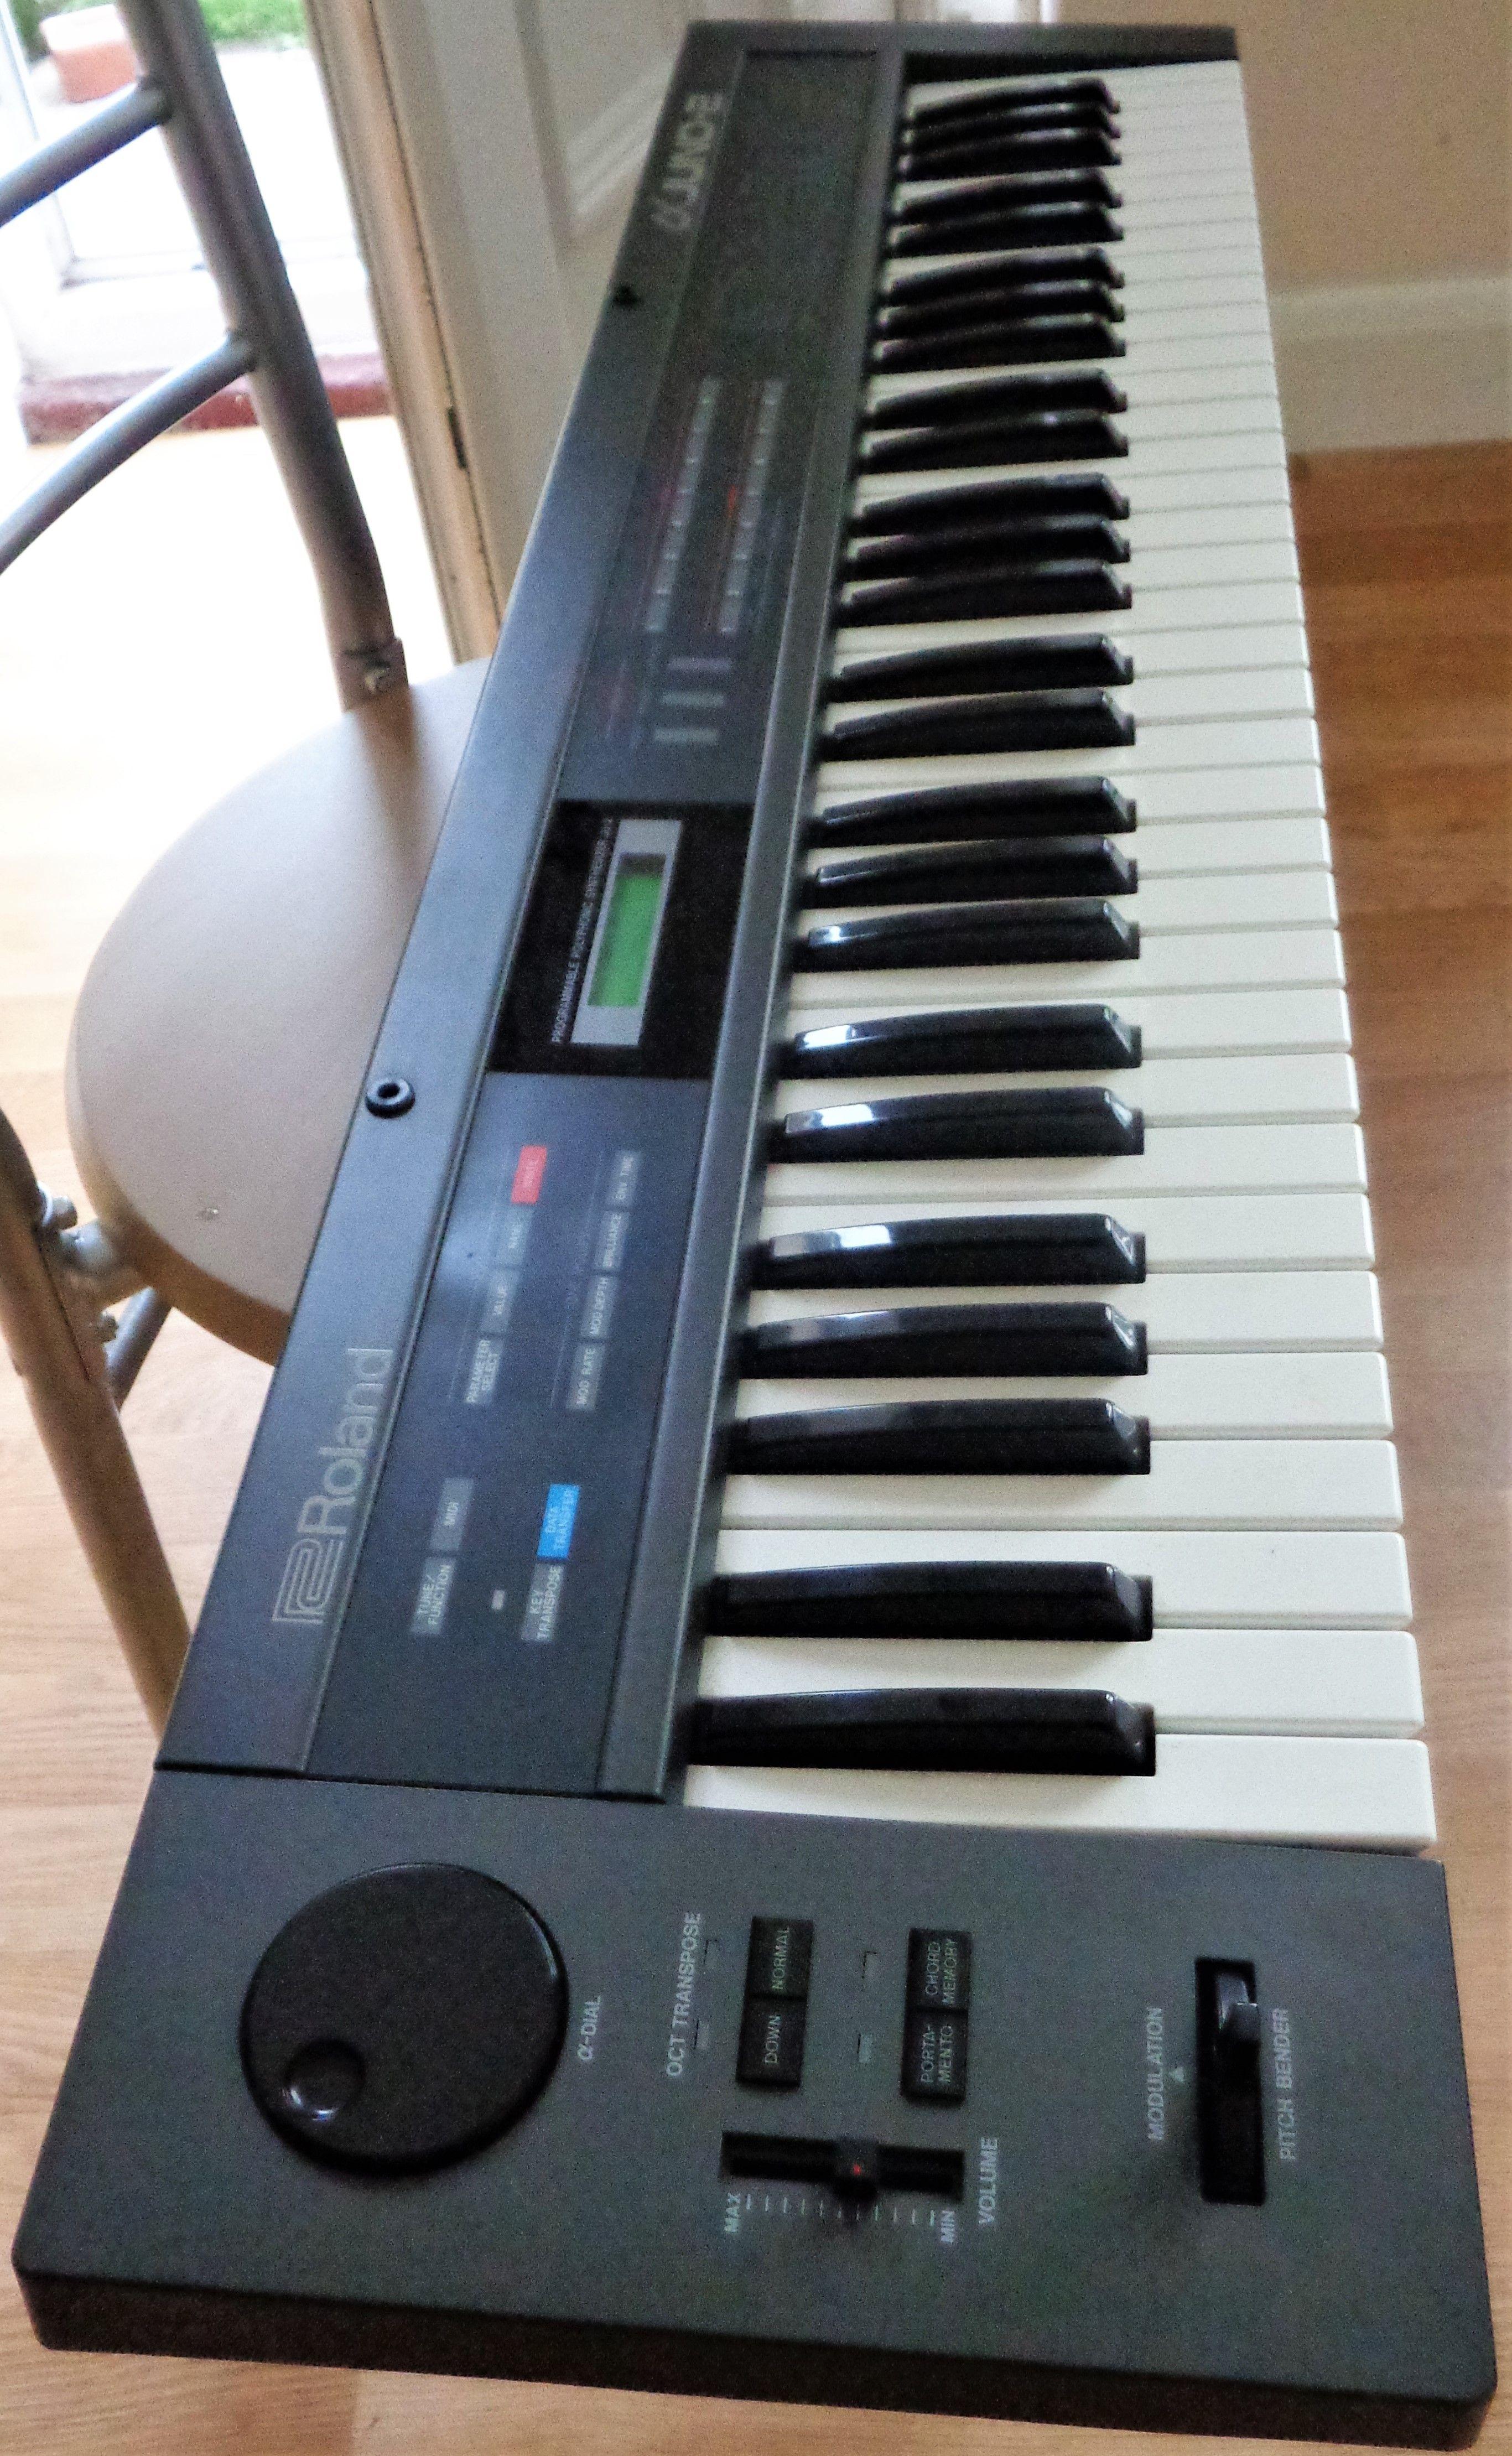 ROLAND ALPHA JUNO 2 | Mr Enigmagg in 2019 | Keyboard, Office phone